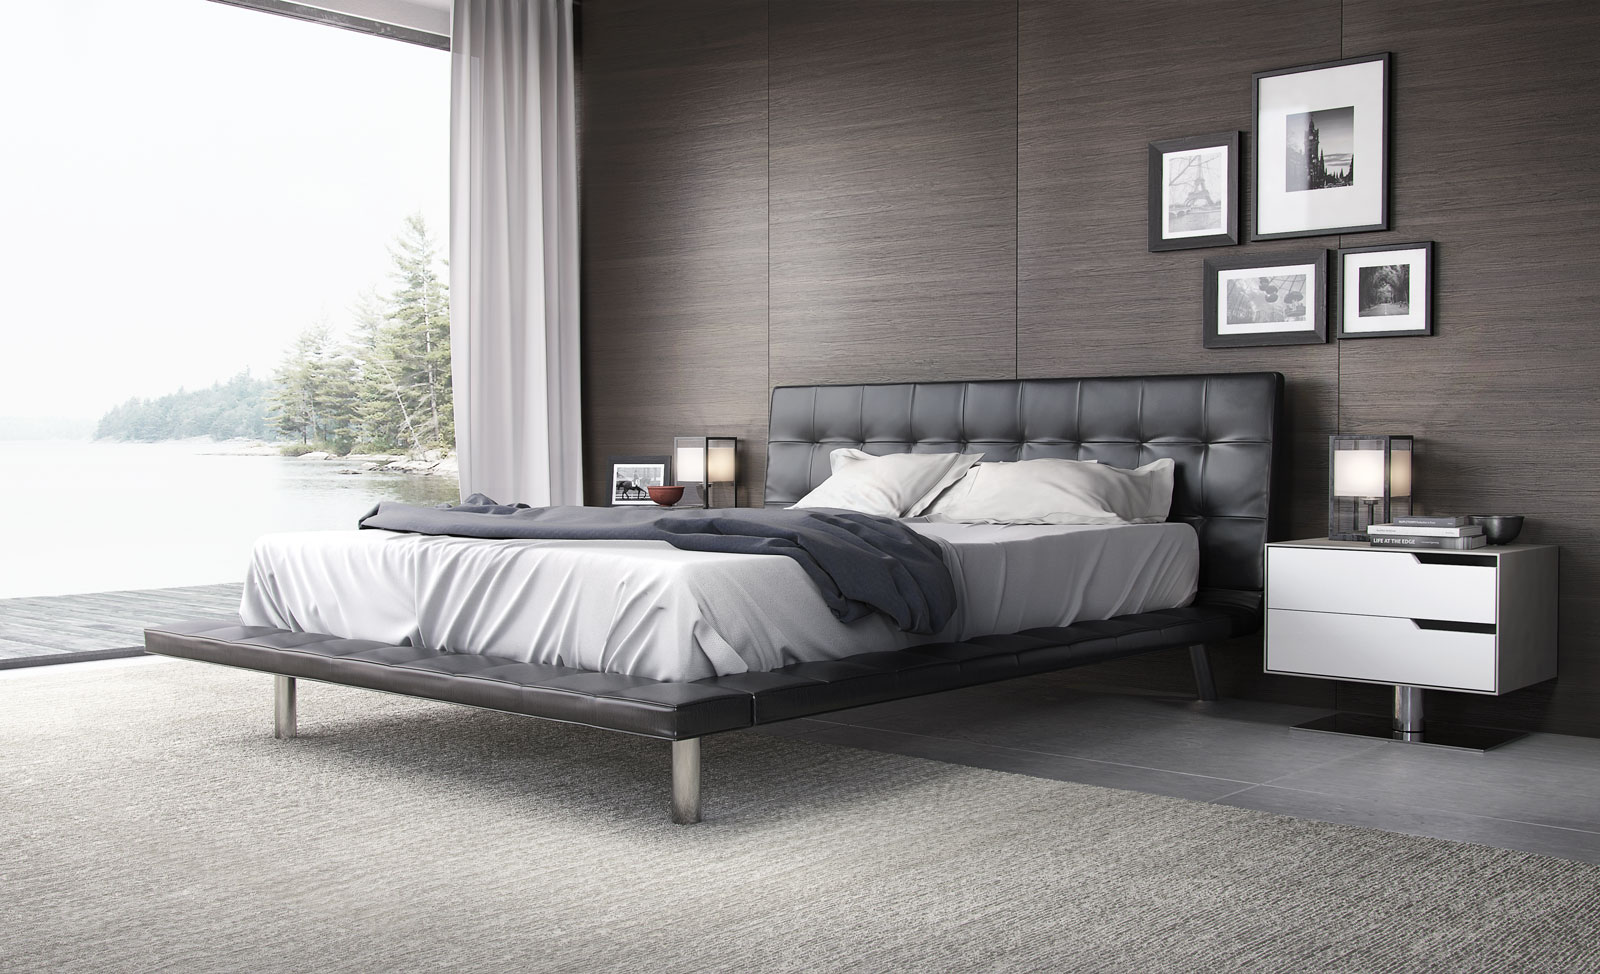 High End Modern Furniture: Fashionable Leather High End Platform Bed New Orleans